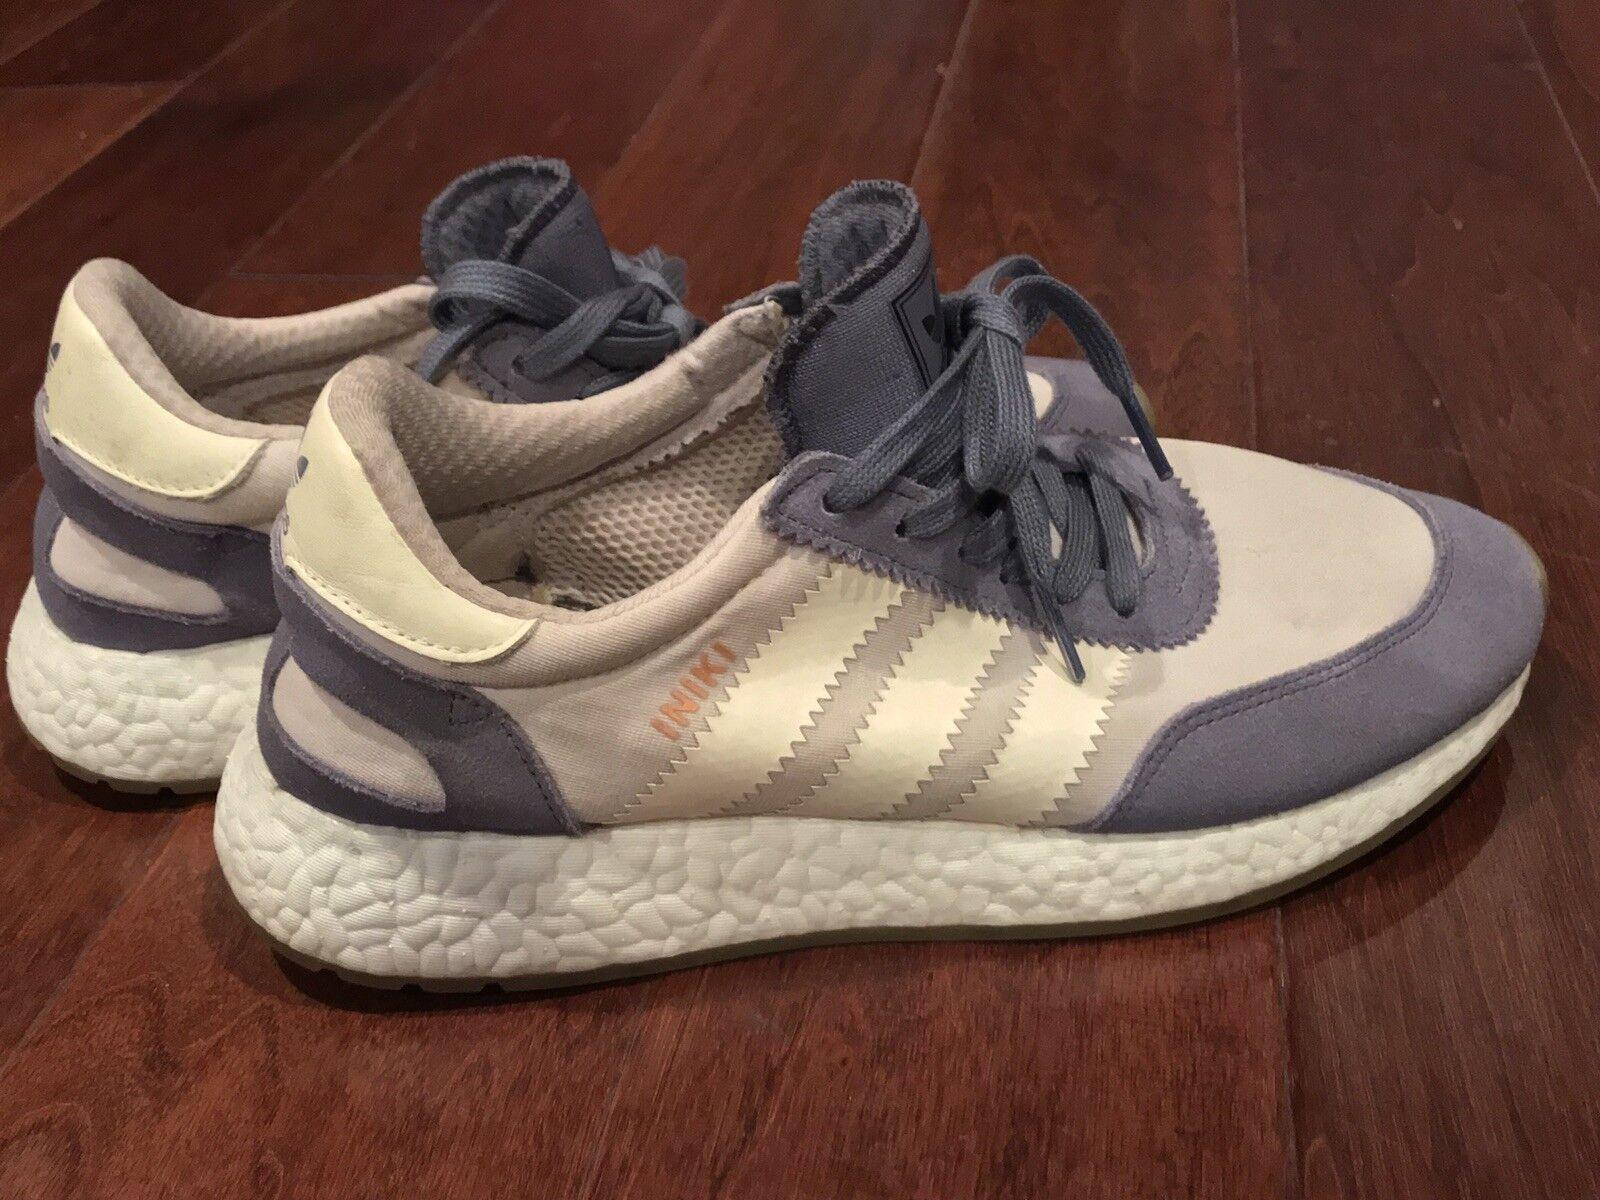 Adidas BA9995 Originals Womens Iniki  Purple Cream Athletic Running Shoe Sz 9